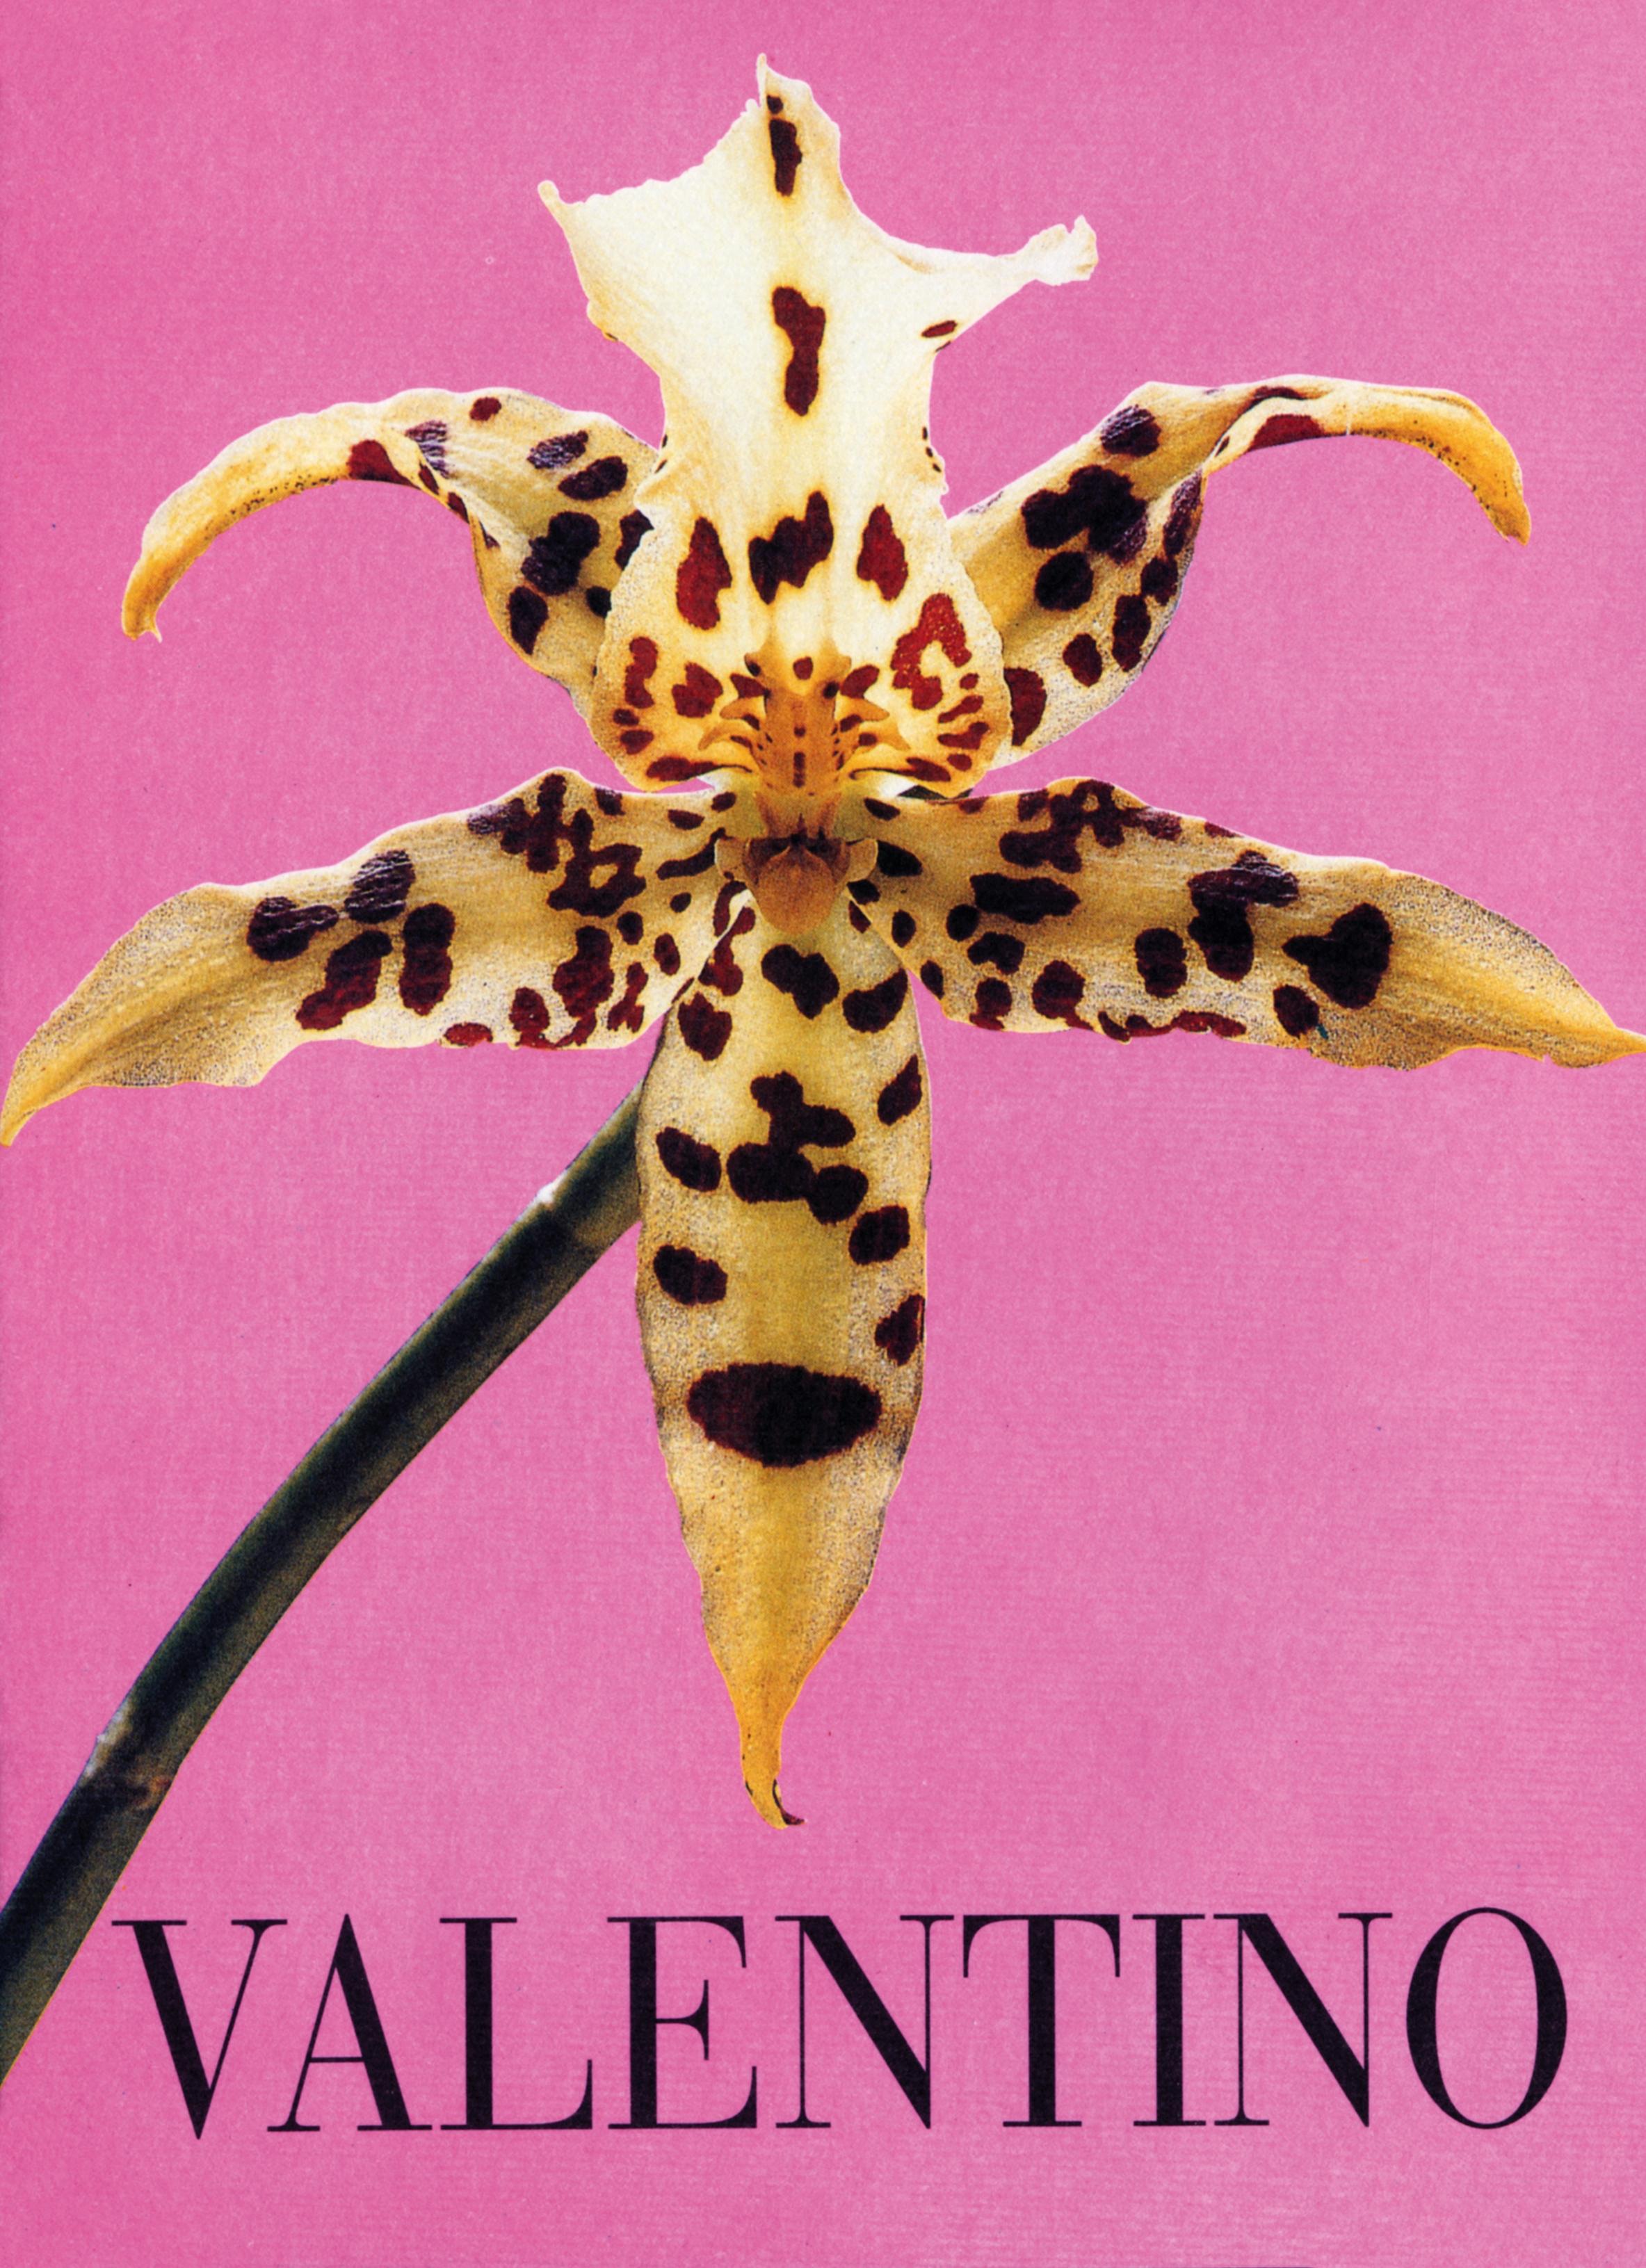 176 VALENTINO